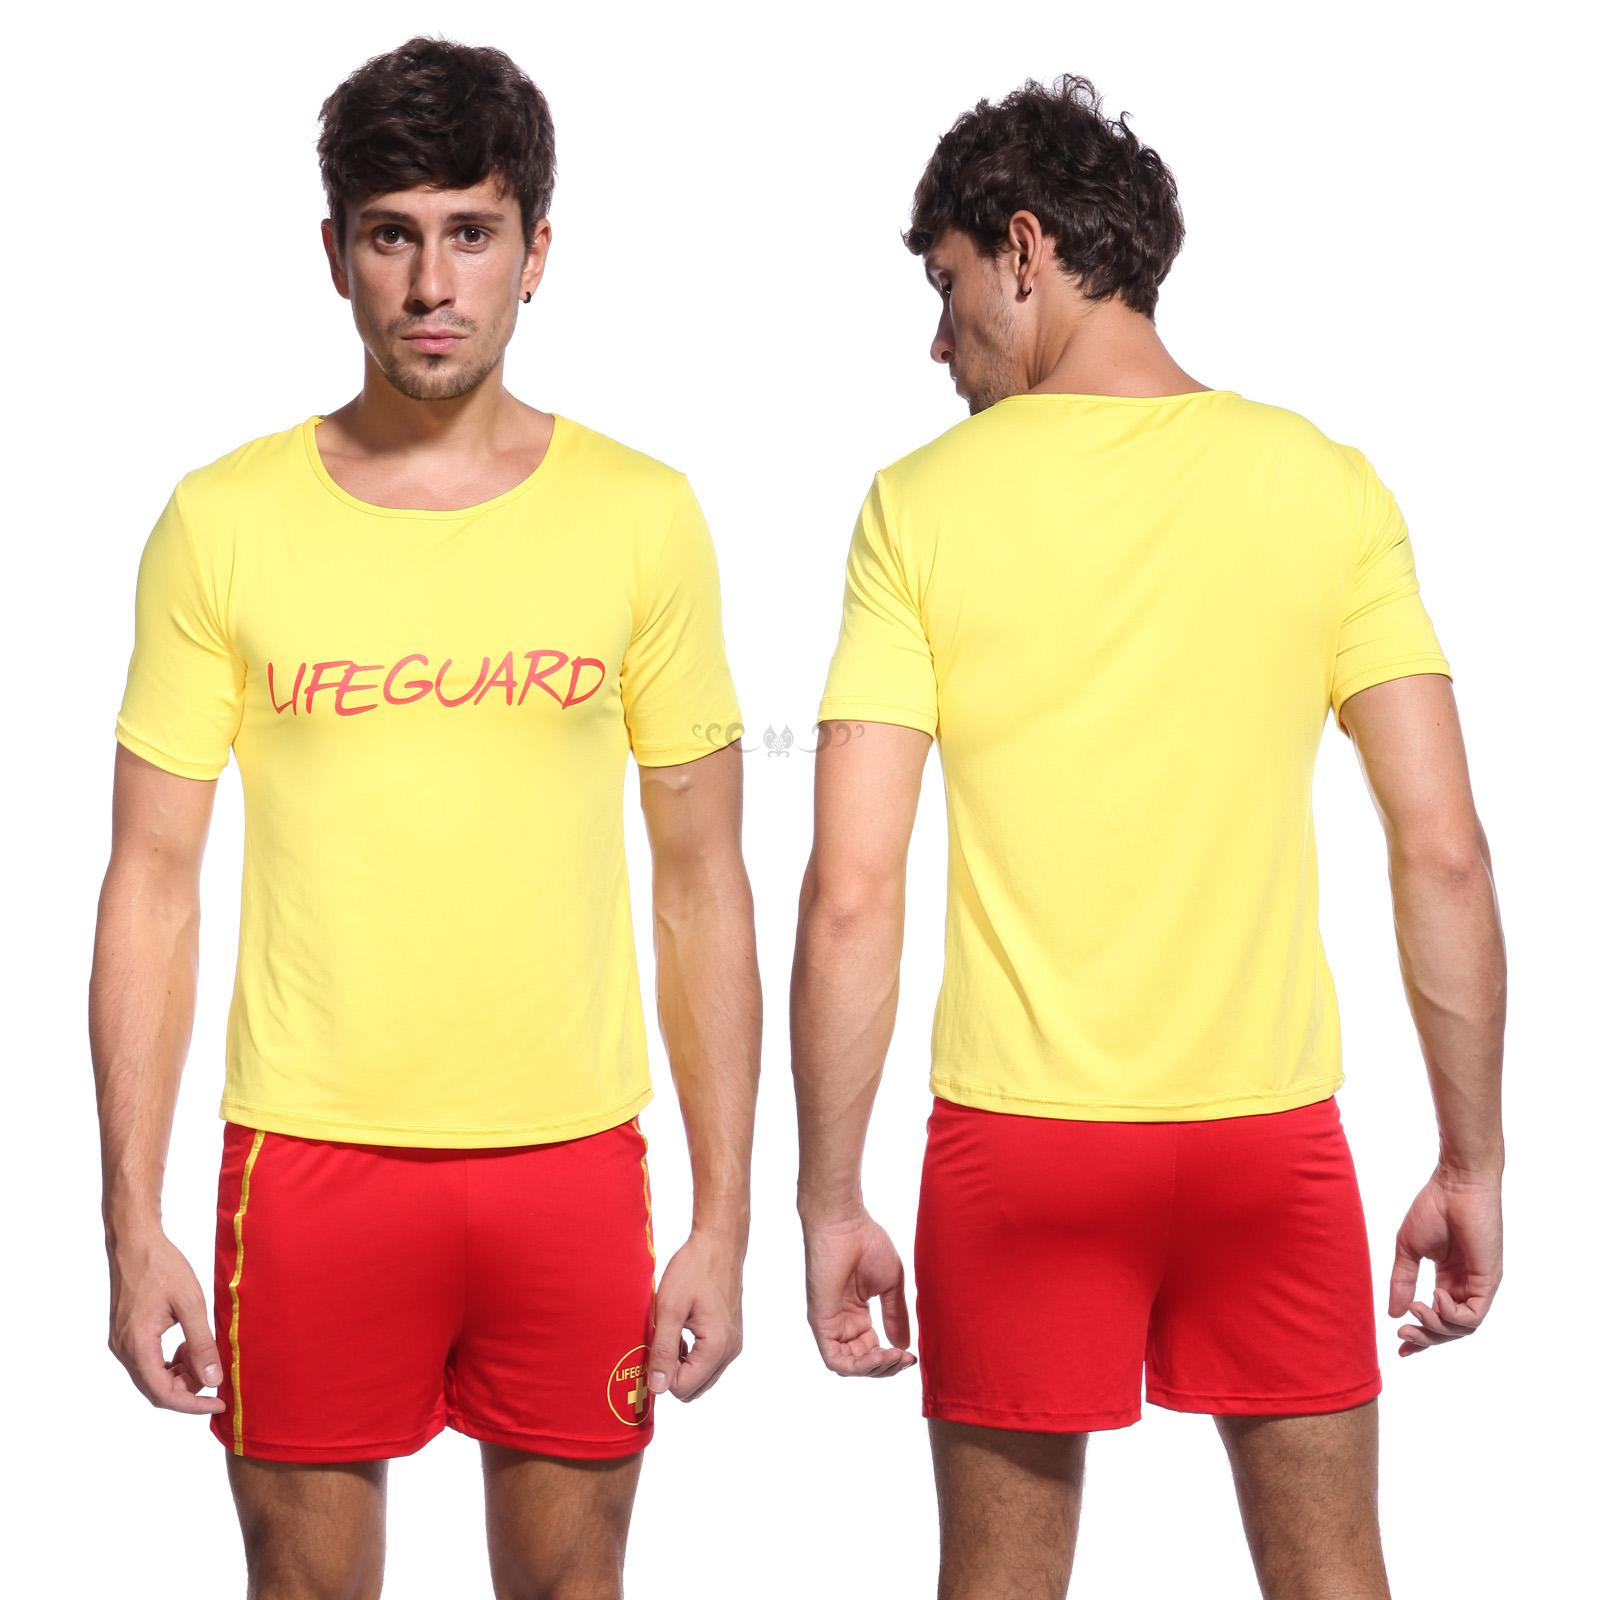 c8ed8a6ddc TV-Series-Life-Guard-Fancy-Dress-Up-Lifegurad- Sc 1 St EBay. image number 9  of lifeguard costume men ...